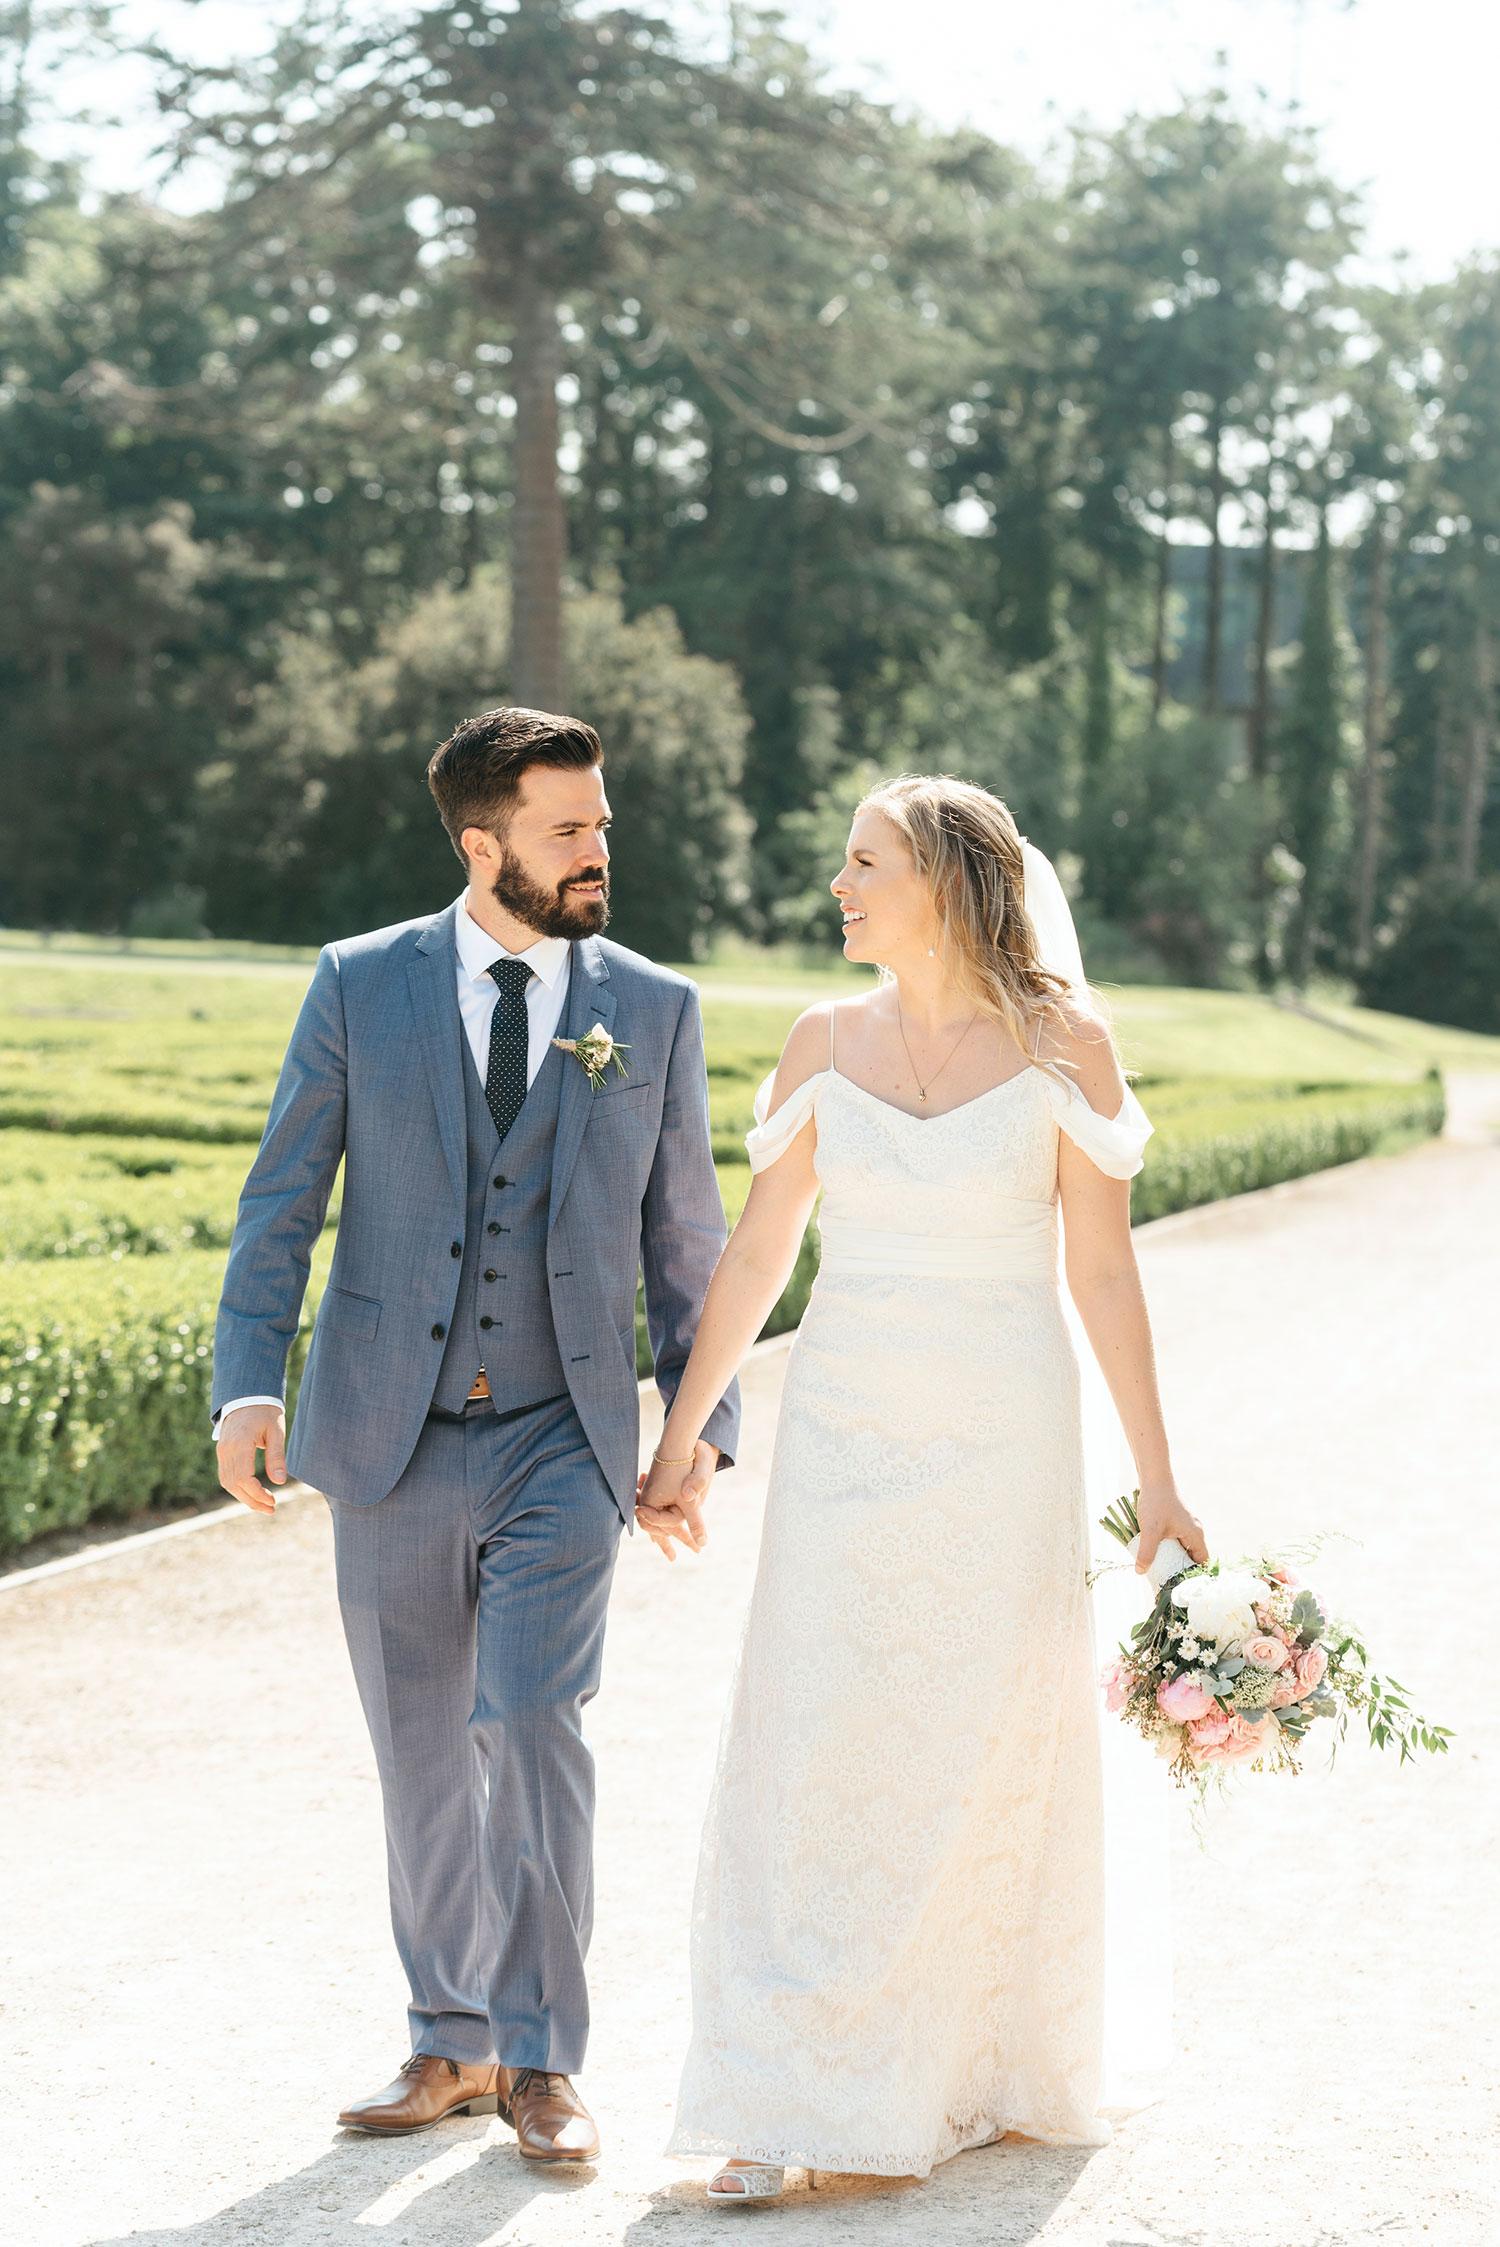 castlemartyr-wedding-photography-0065_0436.jpg